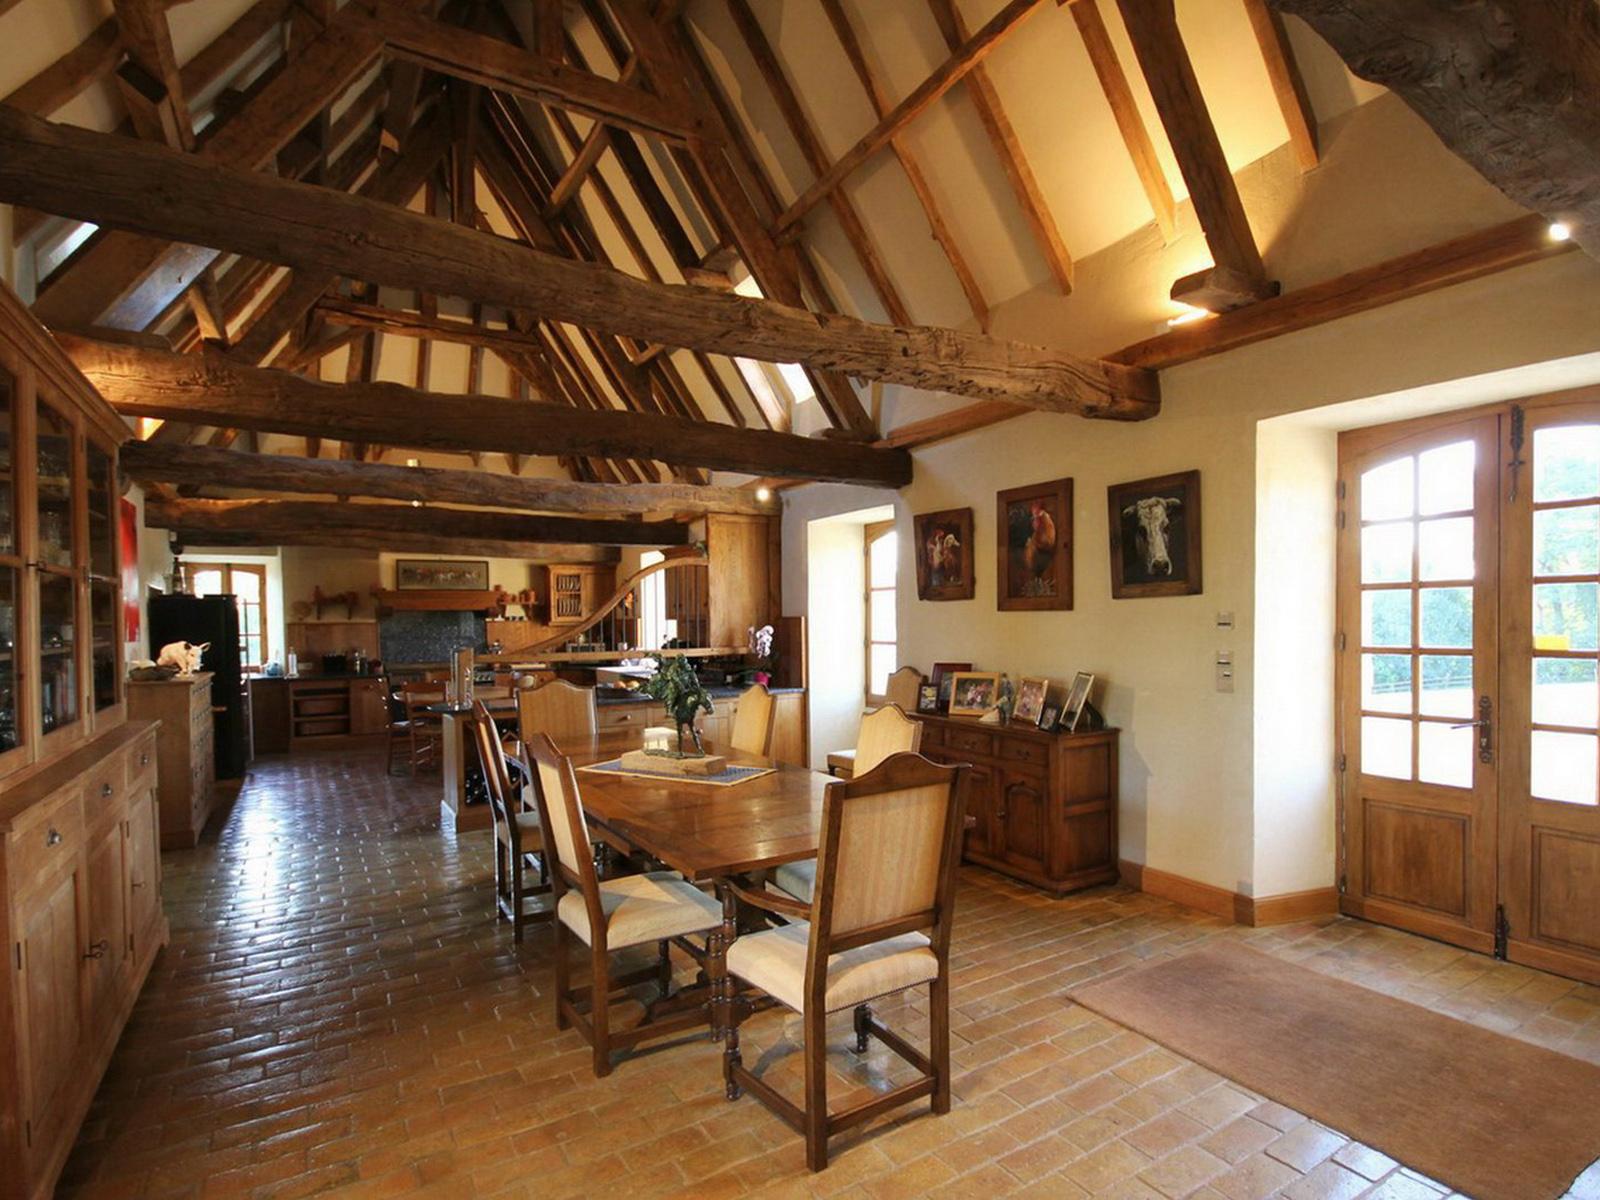 Property Of 18th CENTURY MANOR, 170 ACRES ESTATE, BERGERAC